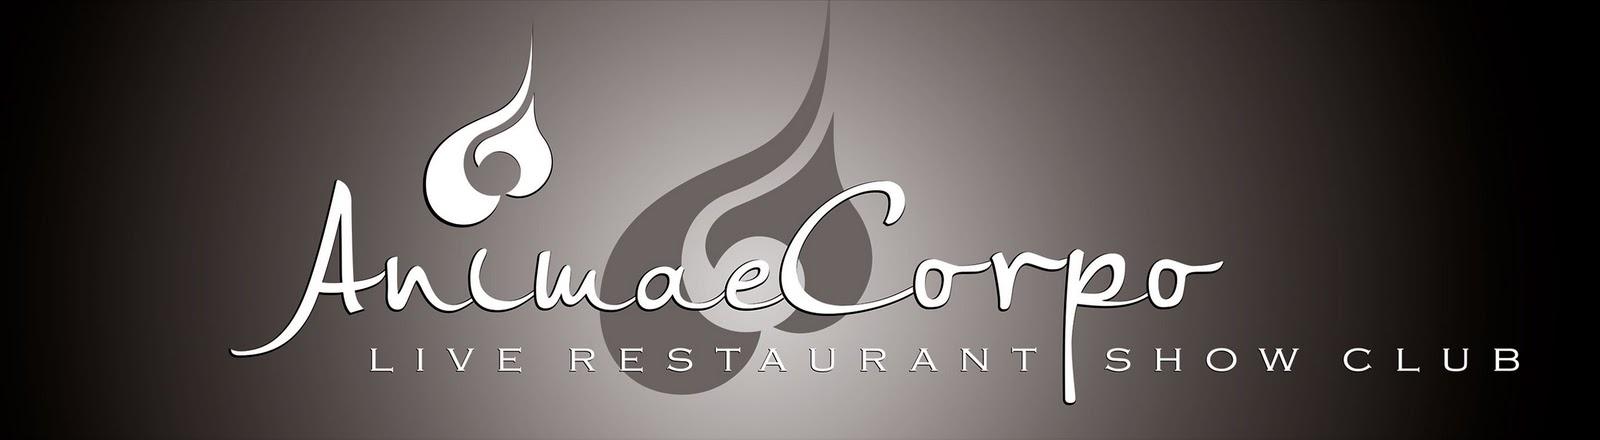 Discoteca anima e corpo live restaurant show club hd for Arp arredamenti